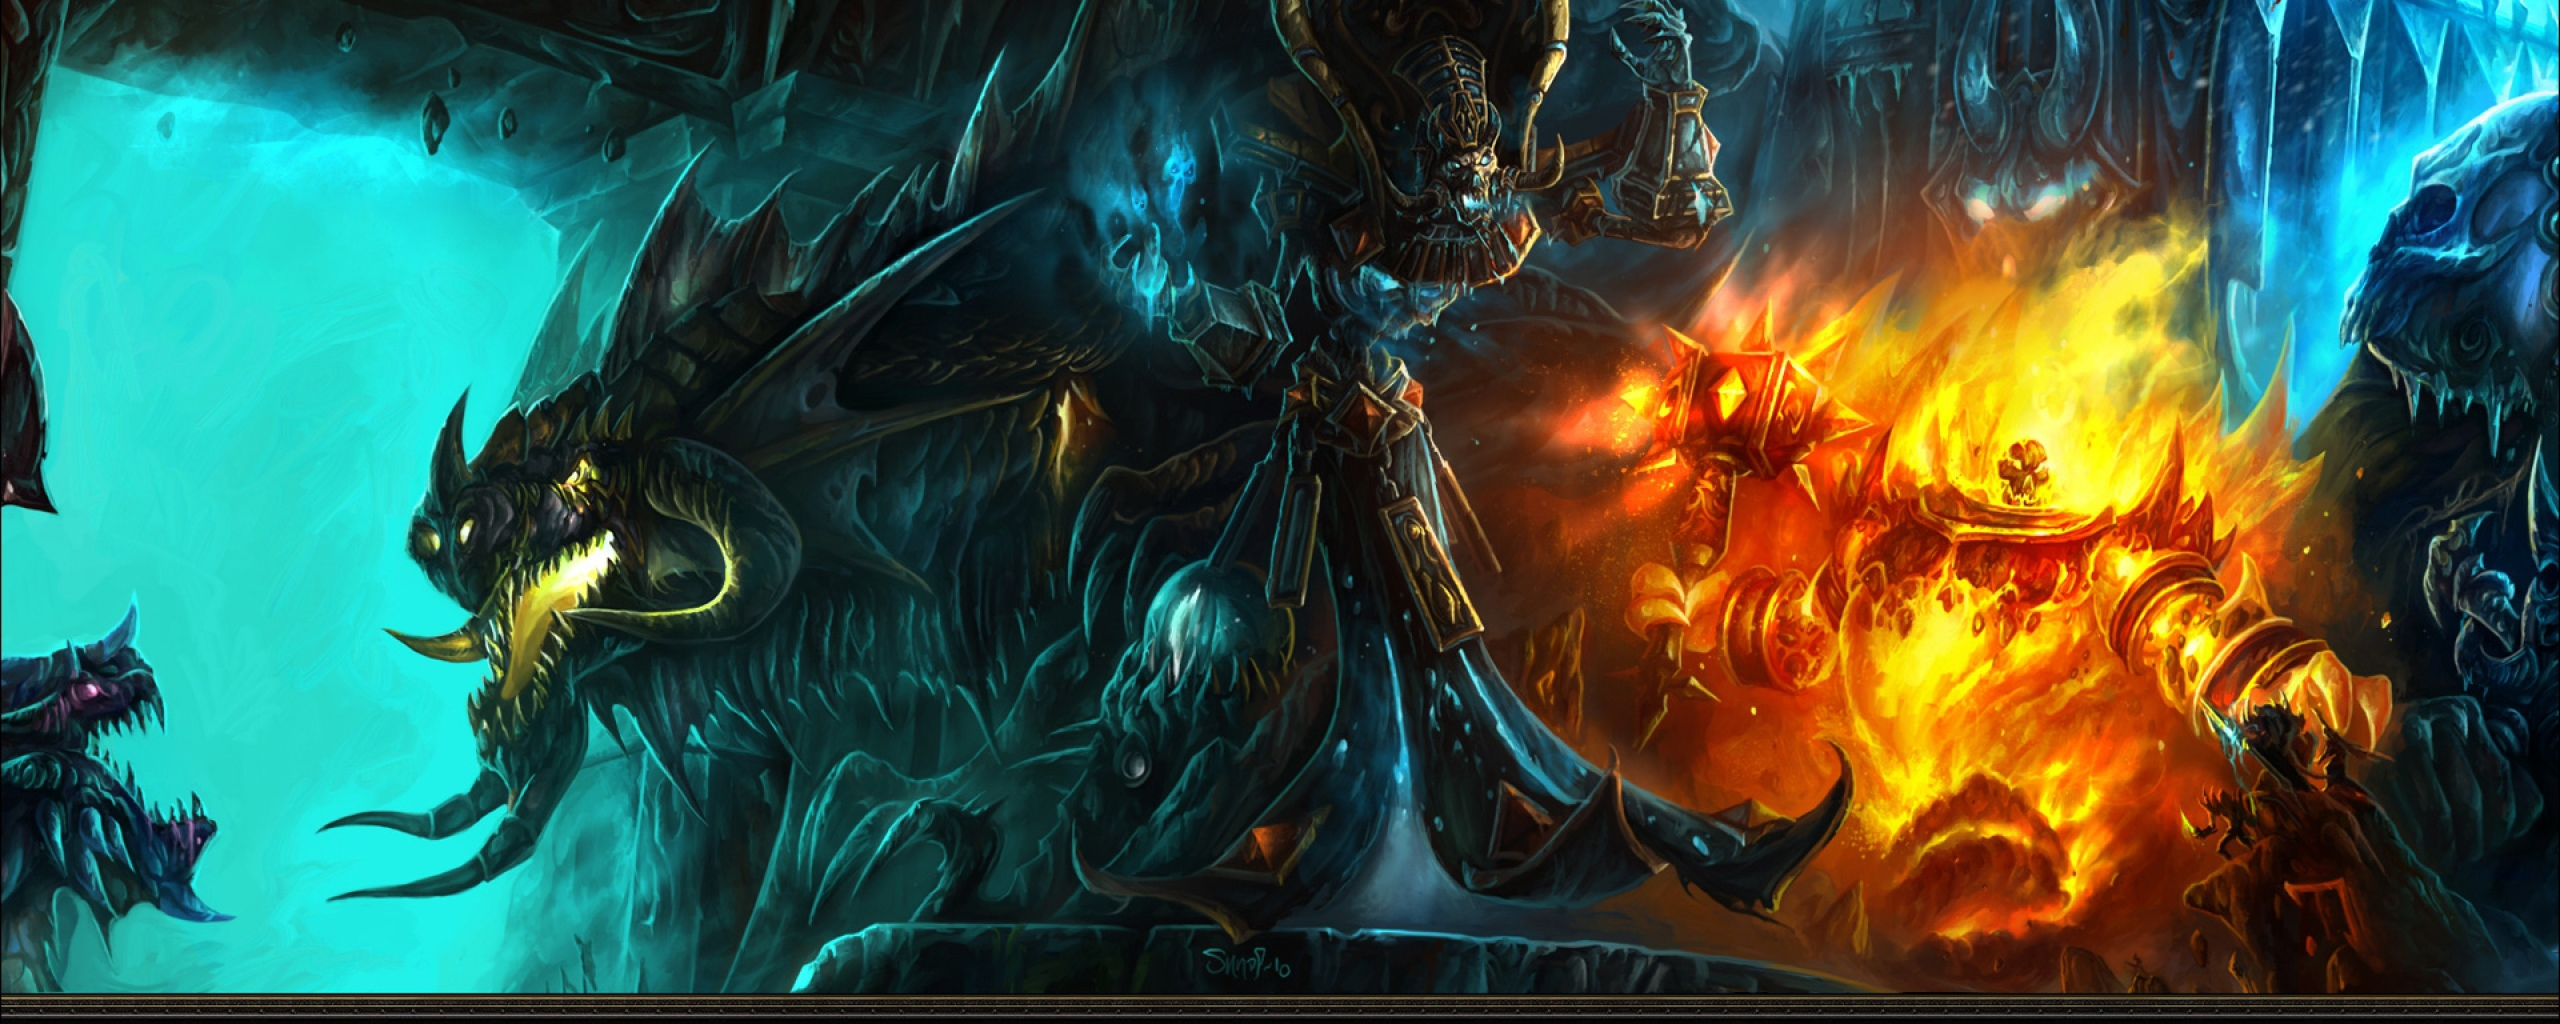 World Of Warcraft Dual Monitor Wallpapers - WallpaperPulse